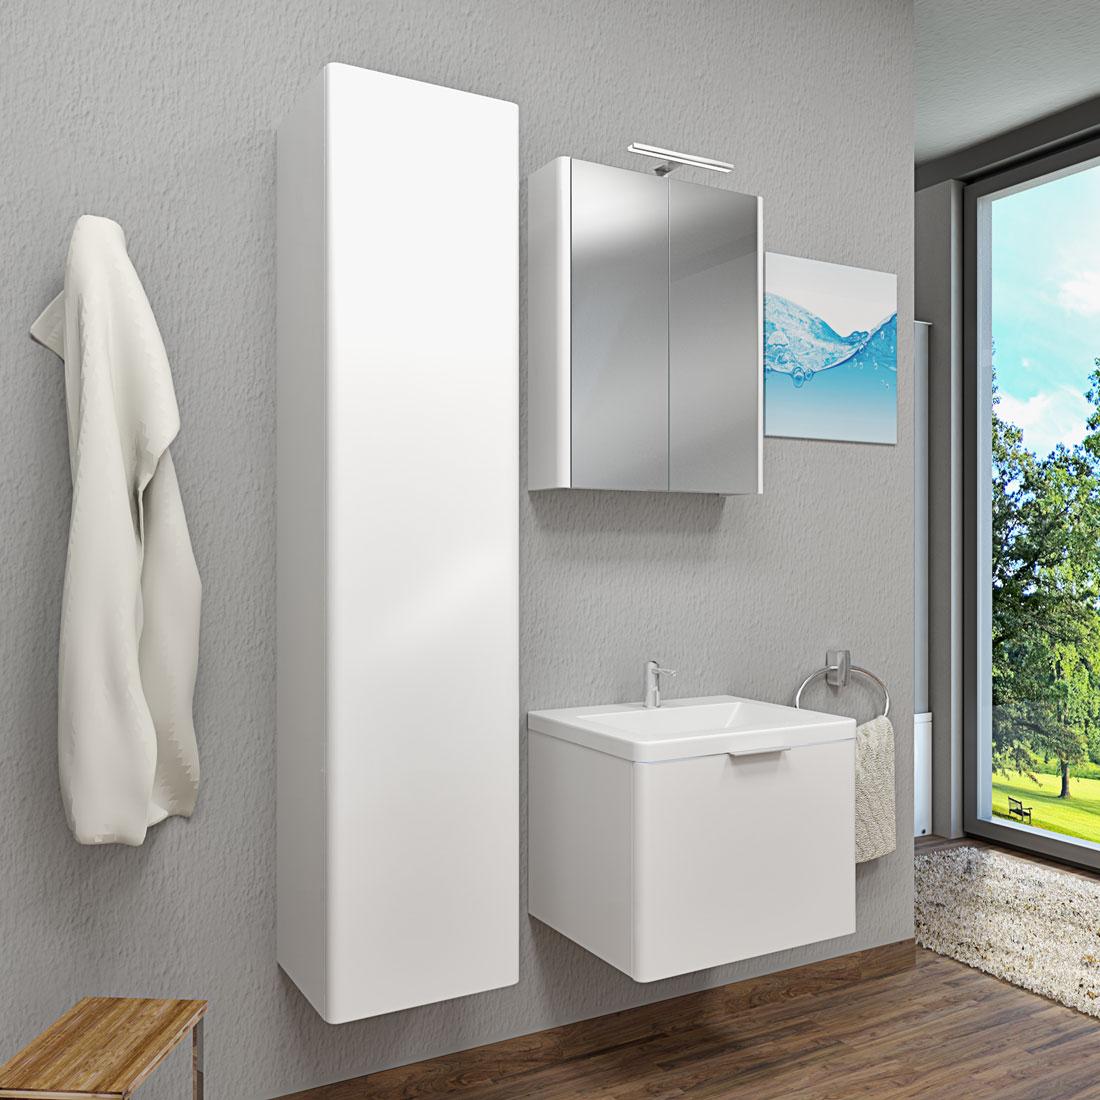 badschrank h ngeschrank hochschrank xl 40x176x36cm curve hochglanz wei. Black Bedroom Furniture Sets. Home Design Ideas